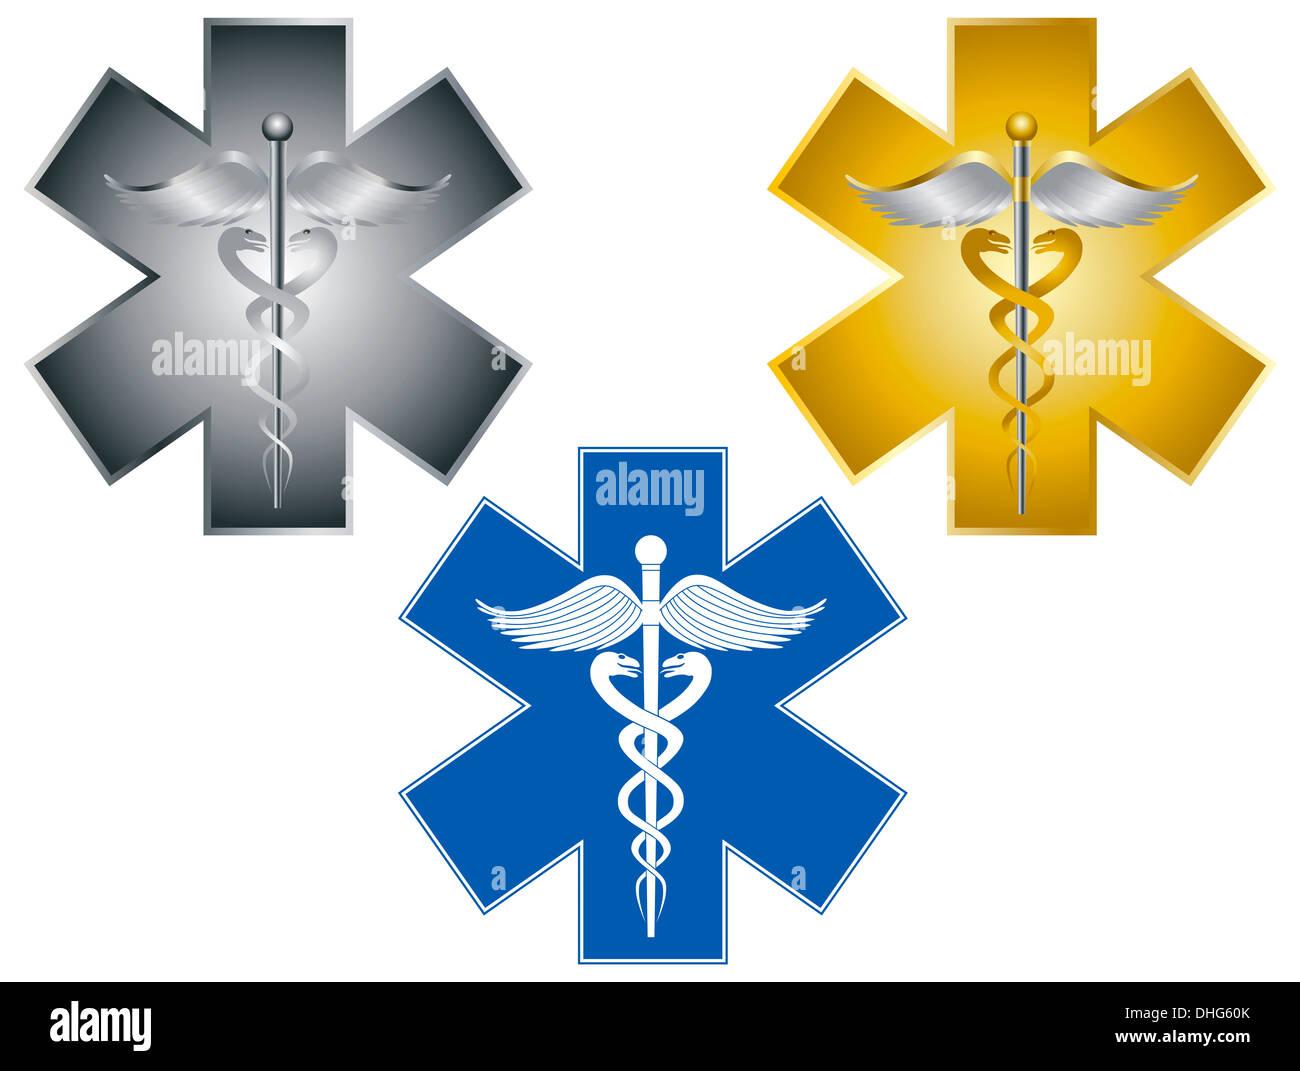 Star Of Life Caduceus Medical Symbol For Health Care Organizations